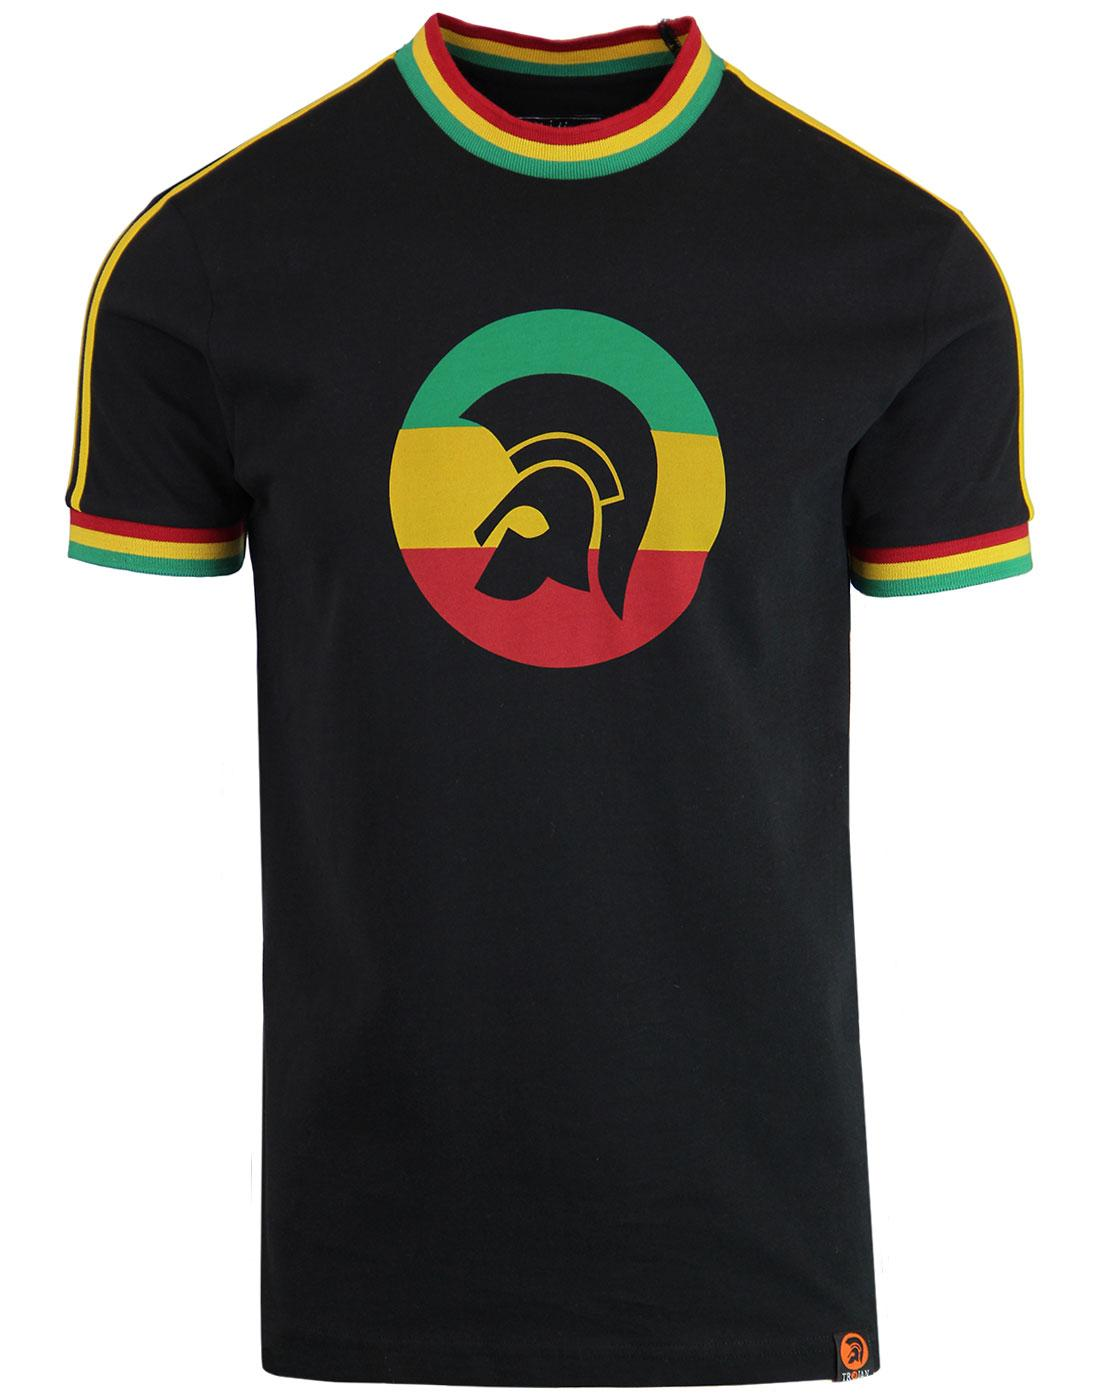 TROJAN RECORDS Retro Mod Rasta Flag Stripe T-Shirt